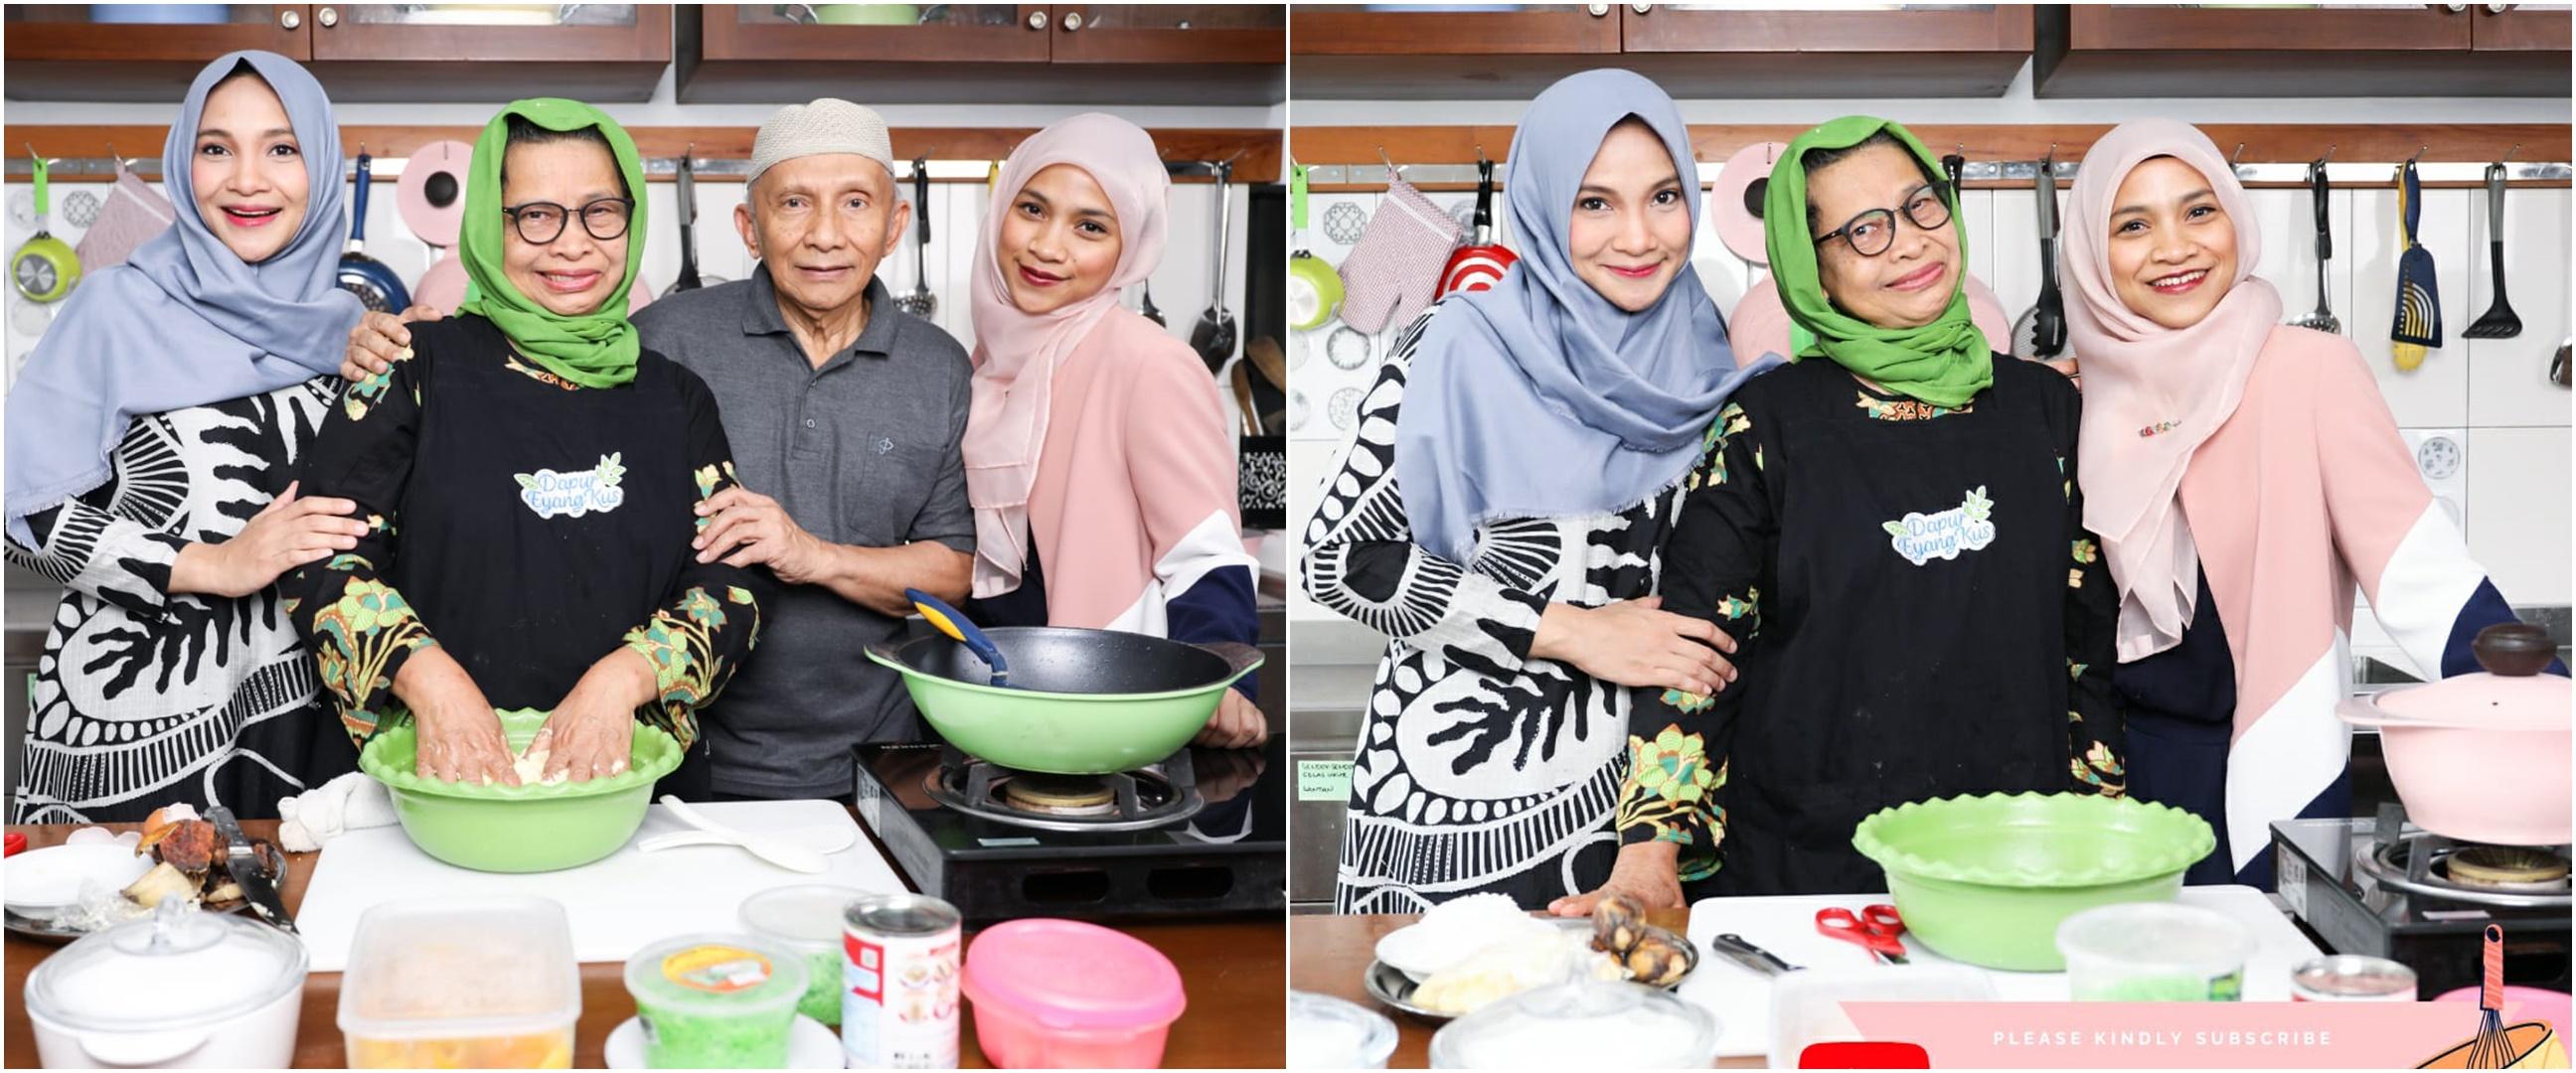 Ultah pernikahan, Amien Rais & istri dapat kado unik dari Hanum Rais